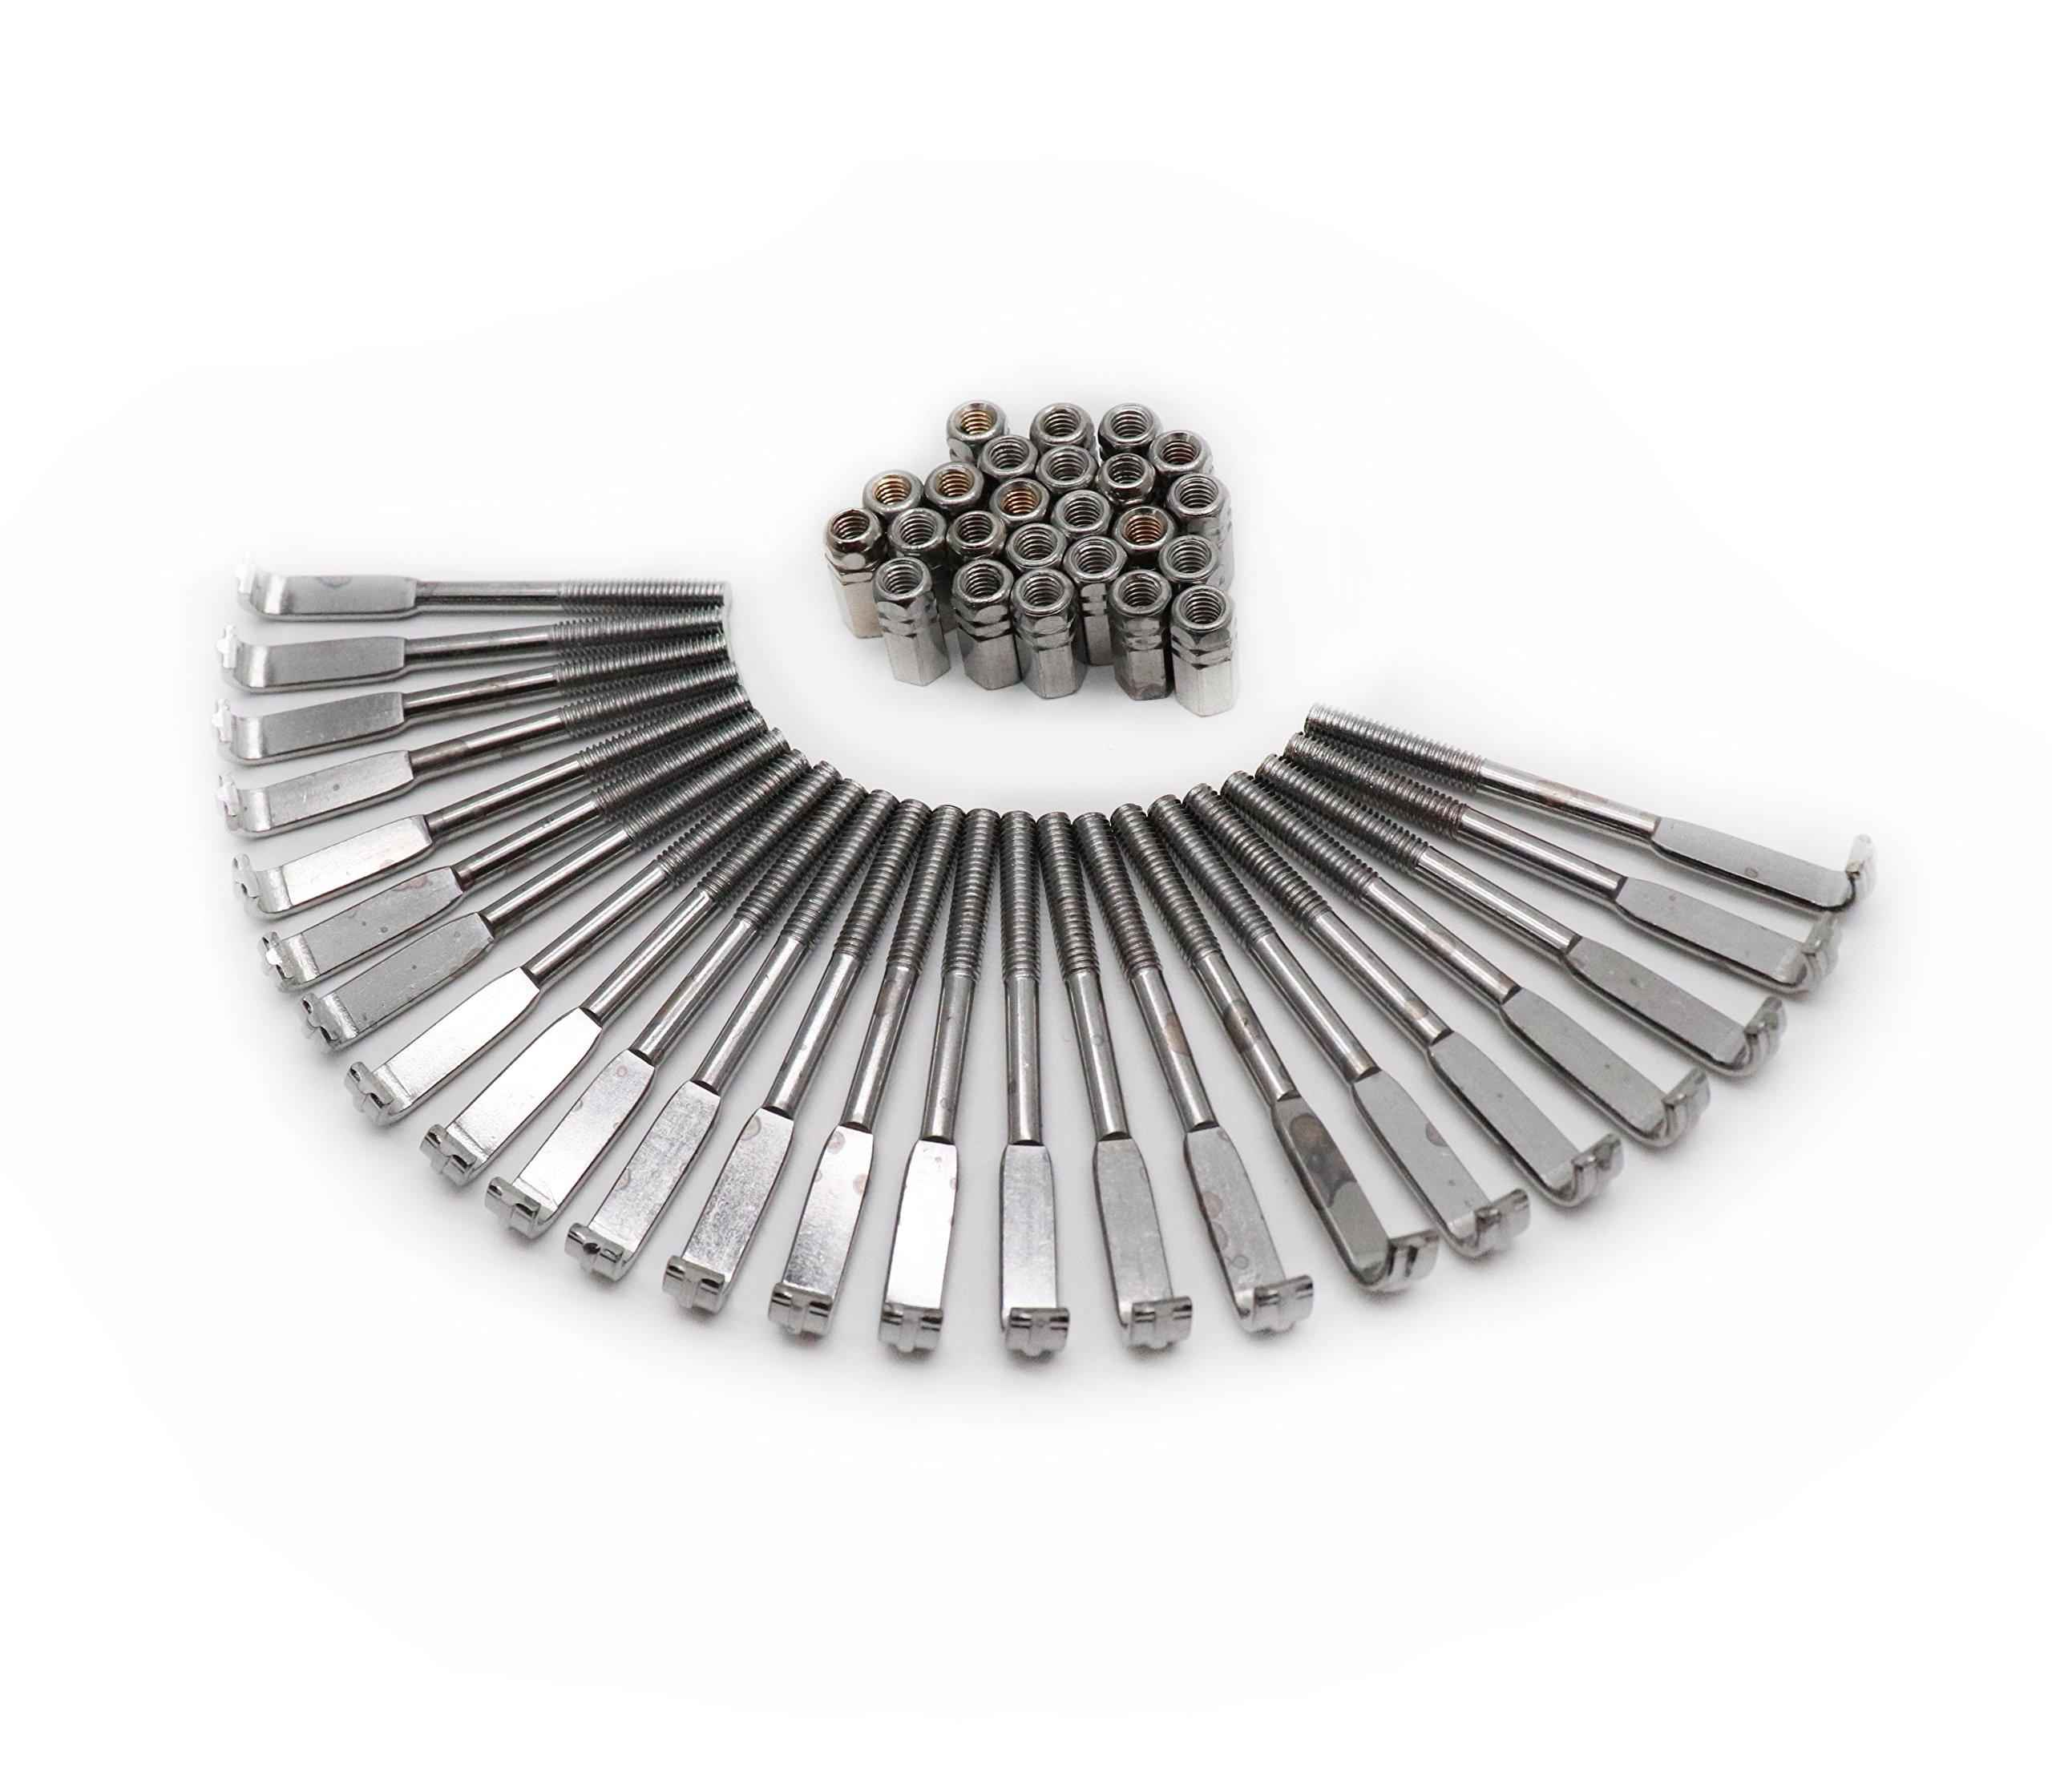 Timiy 1Set of 24Pcs Standard Banjo Bracket Hook & Nut Banjo Accessories Silver